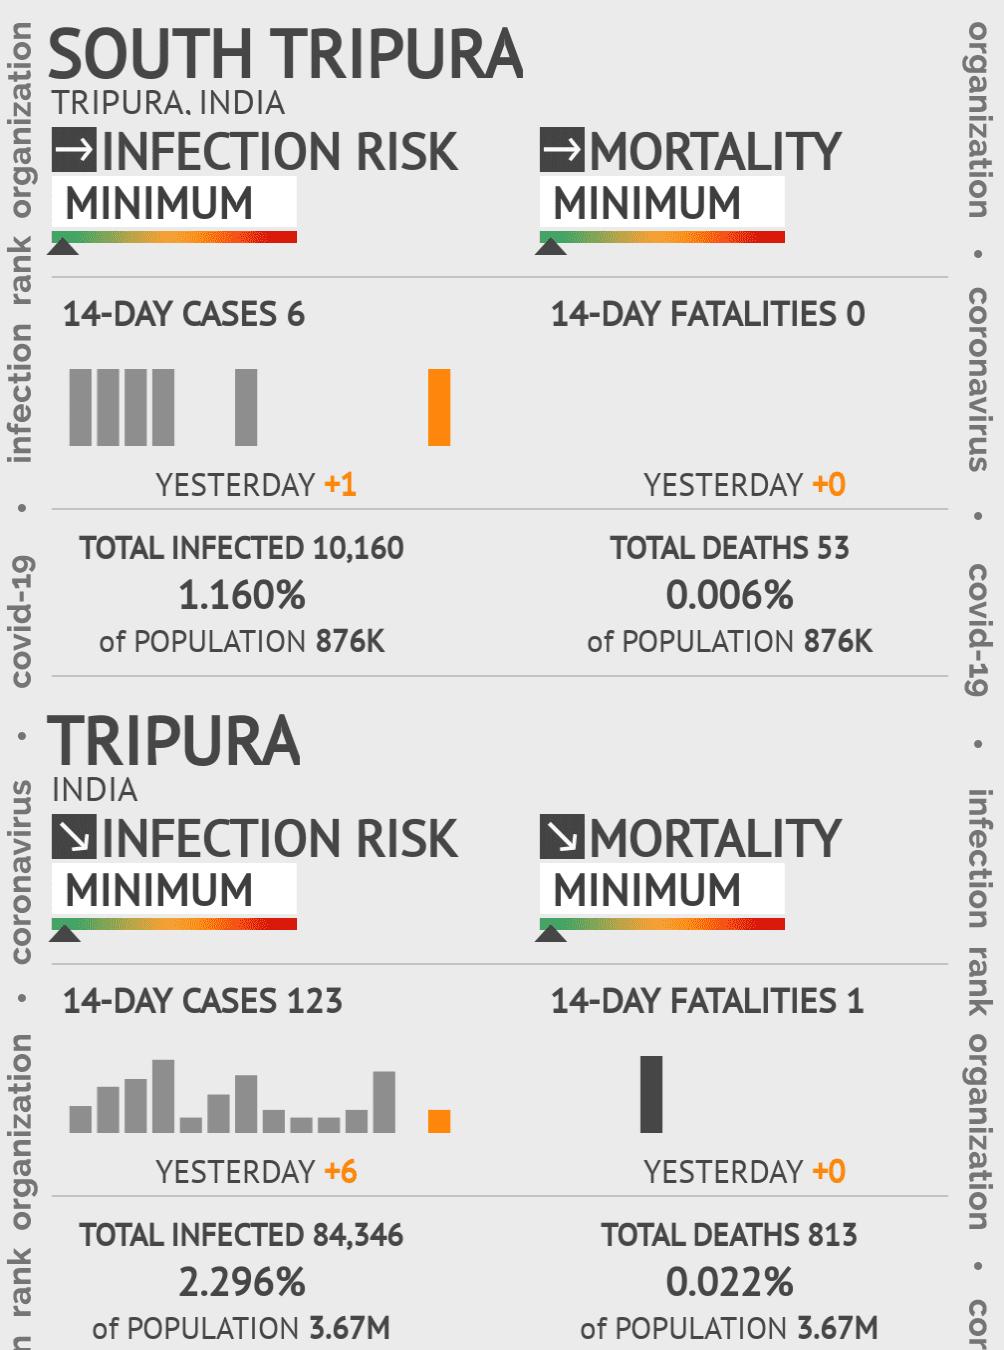 South Tripura Coronavirus Covid-19 Risk of Infection on February 23, 2021